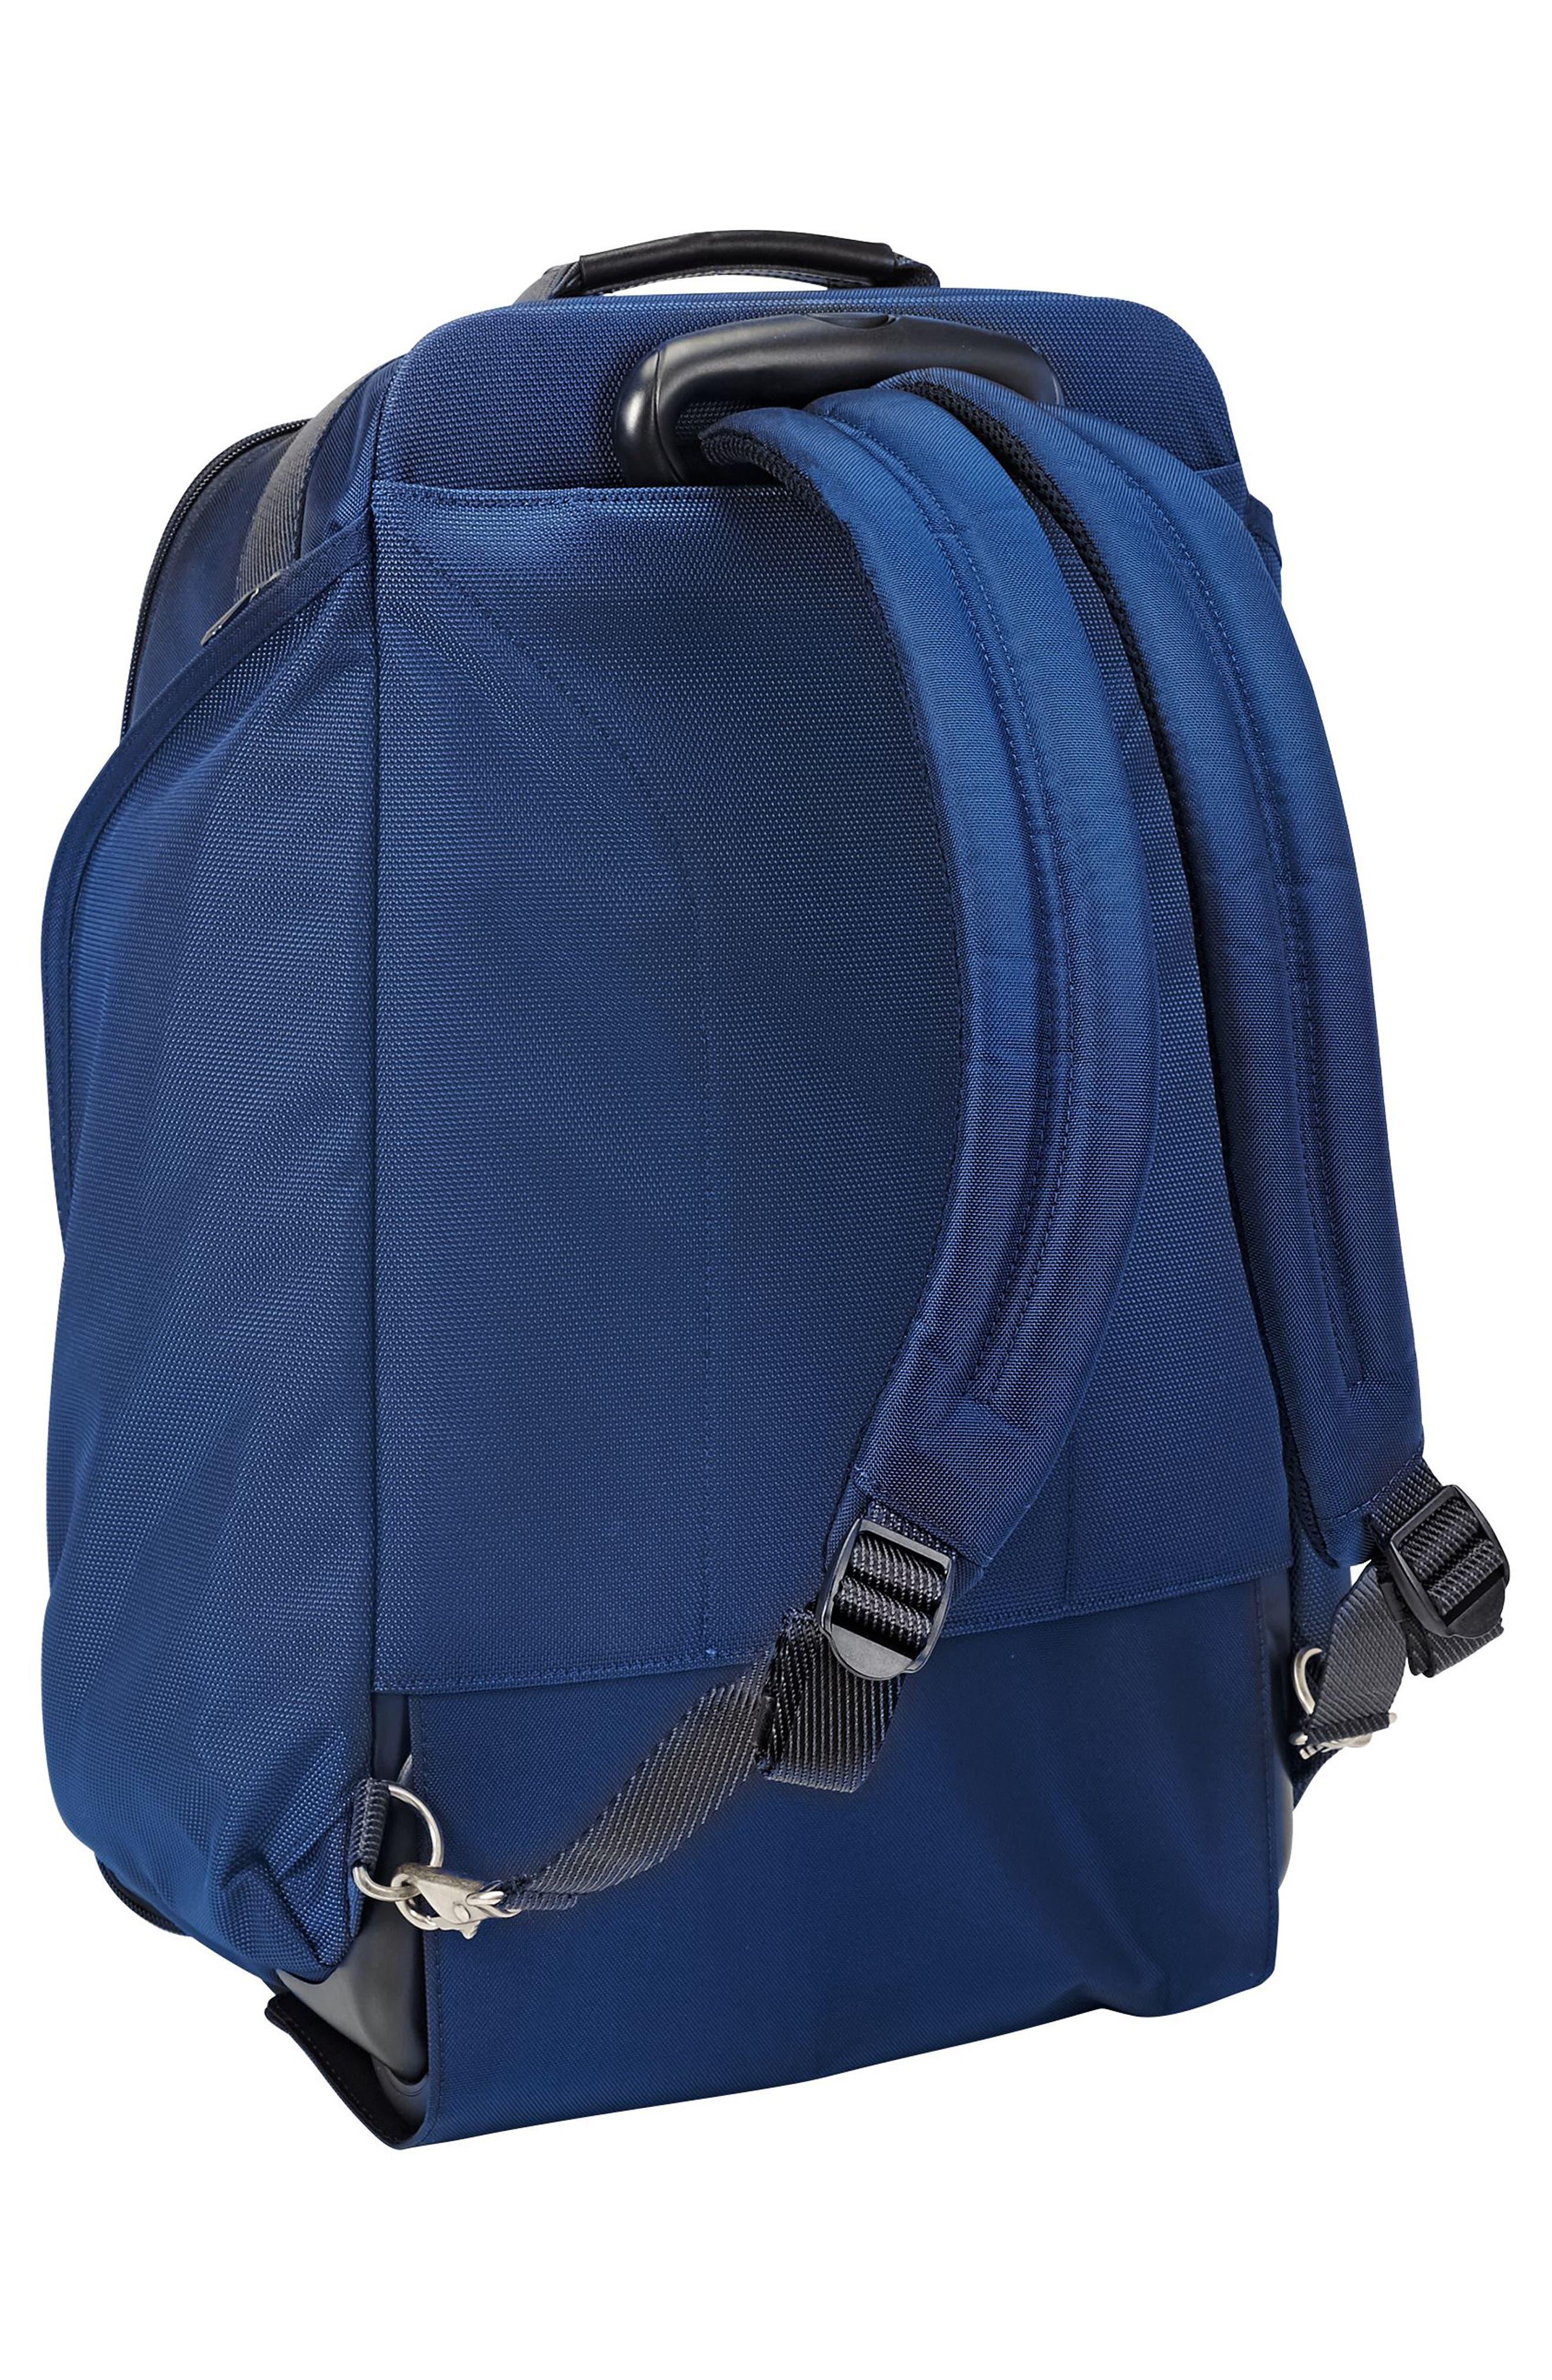 Merge - Rolling Backpack,                             Alternate thumbnail 3, color,                             Ocean Blue